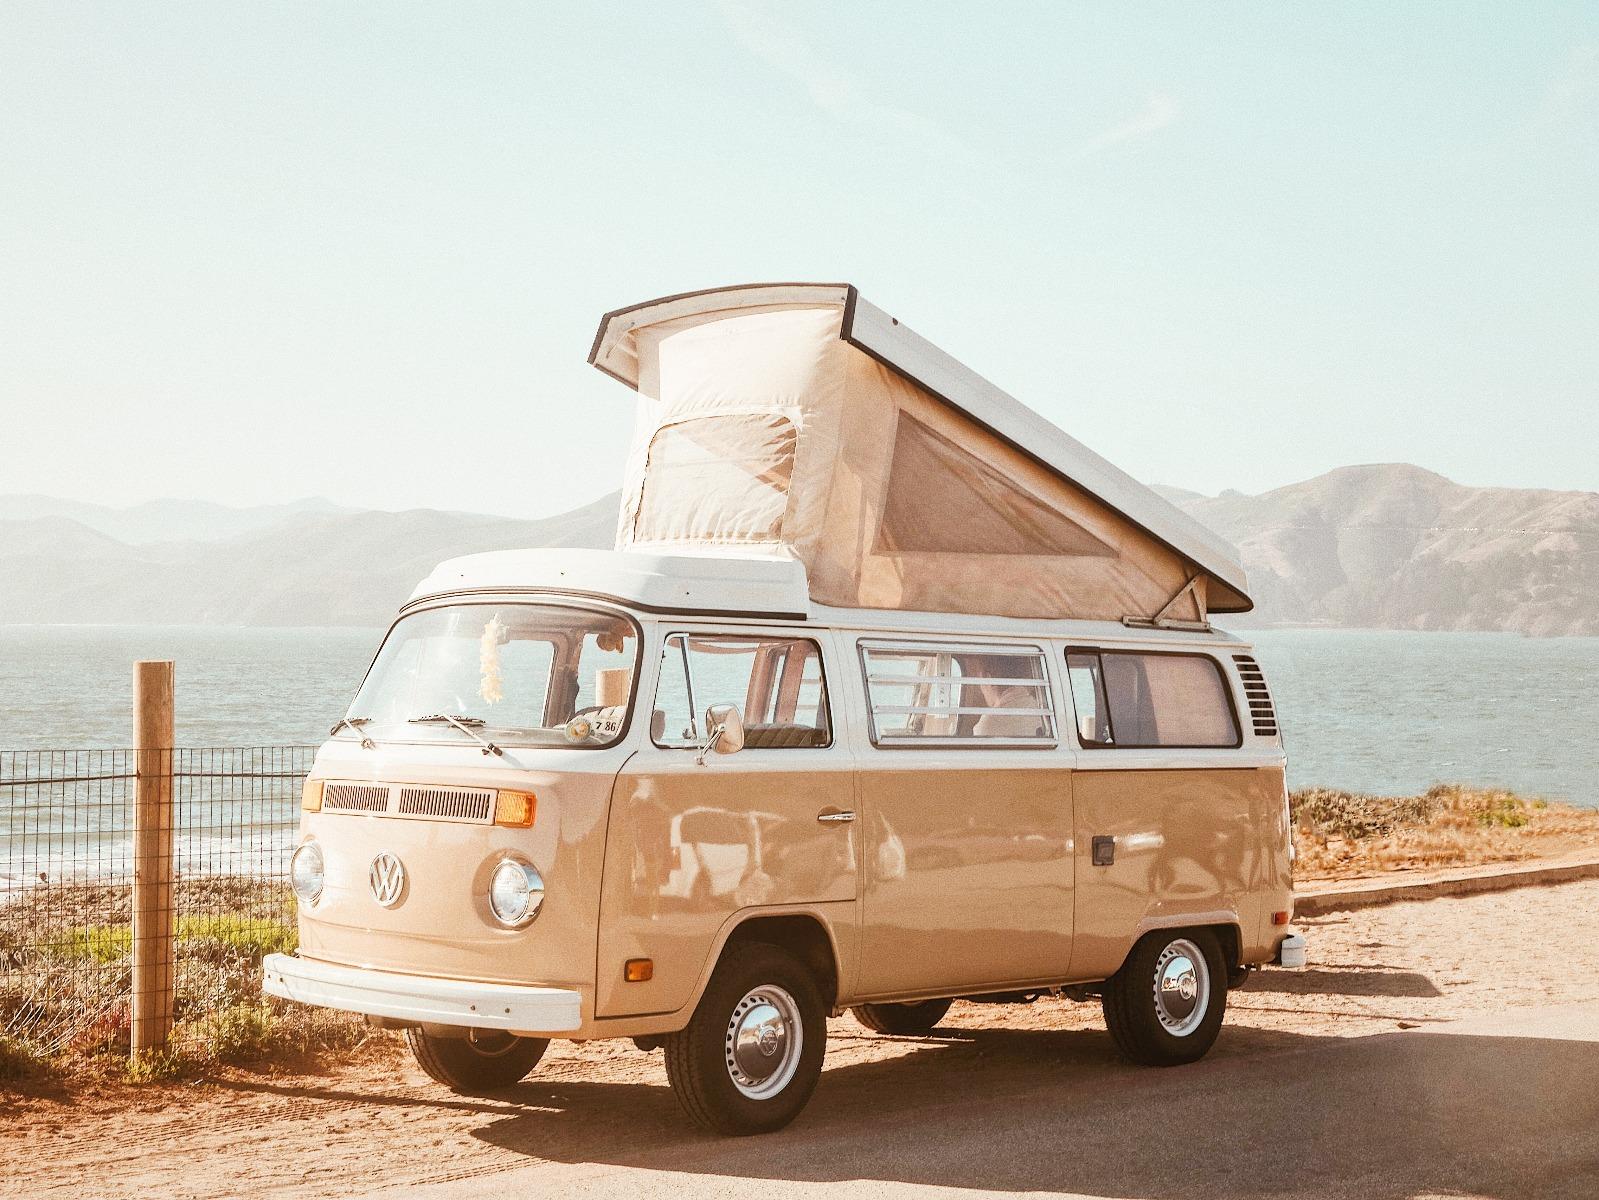 custom sized bed for campervan